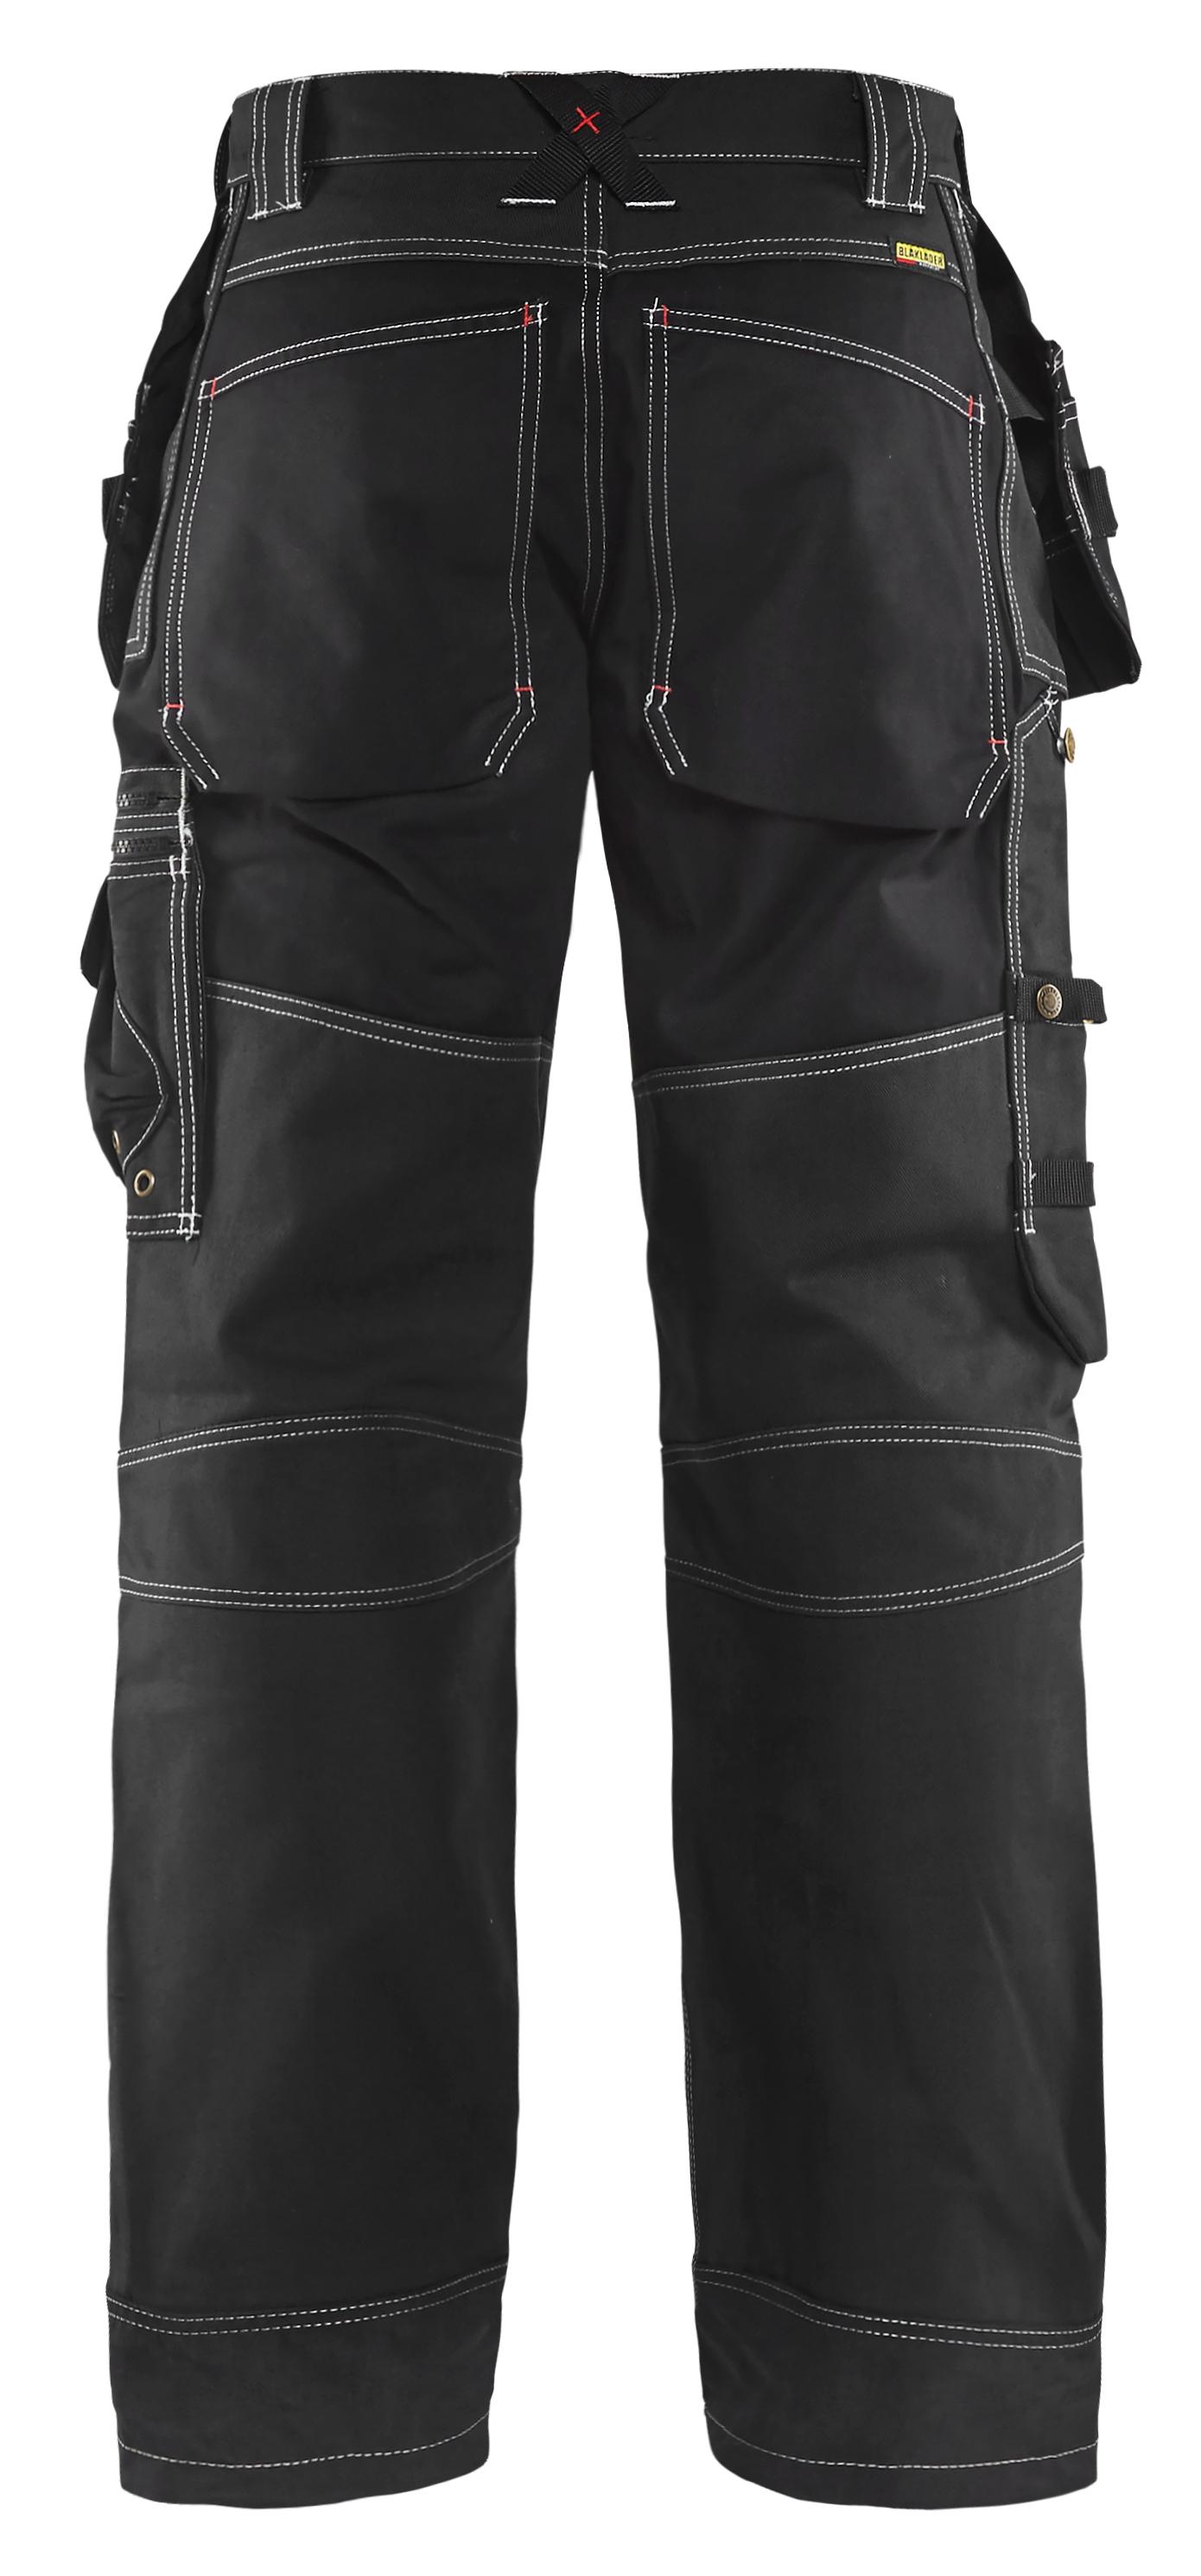 Size 30//30 Blaklader 150013708899D84 X1500 Trousers Craftman Navy Blue//Black